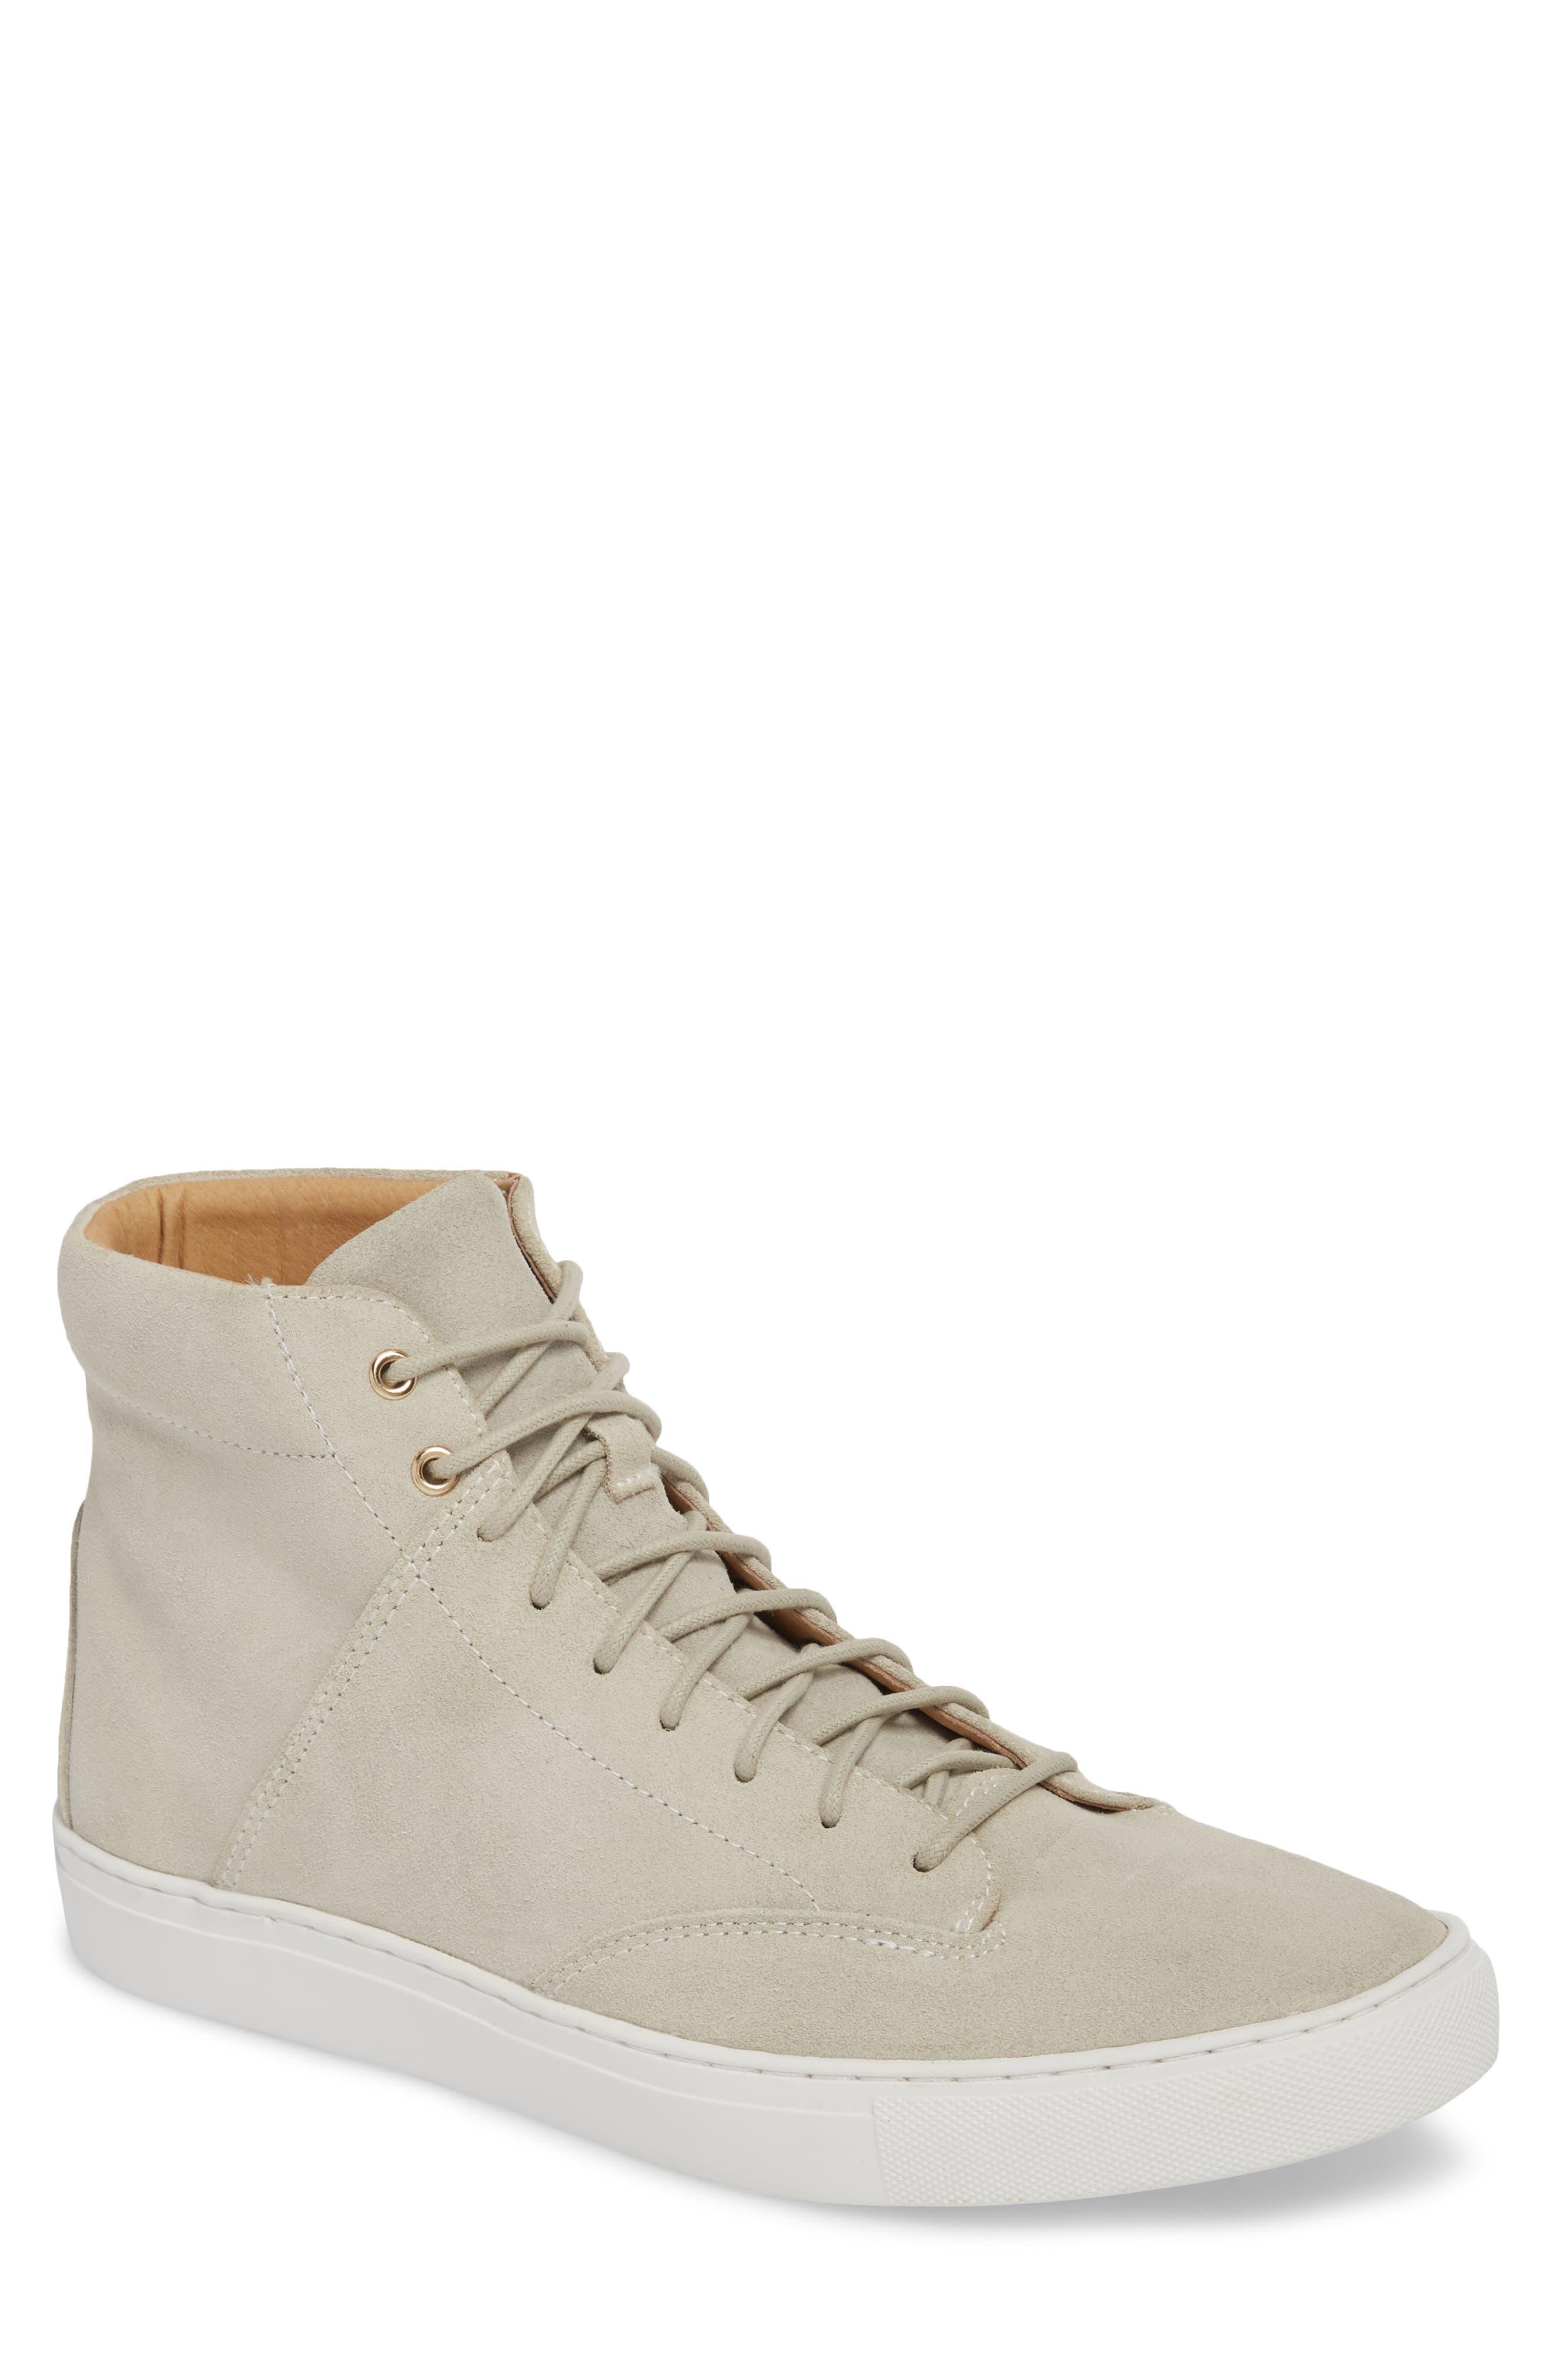 'Porter' High Top Sneaker,                         Main,                         color, Quartz Leather